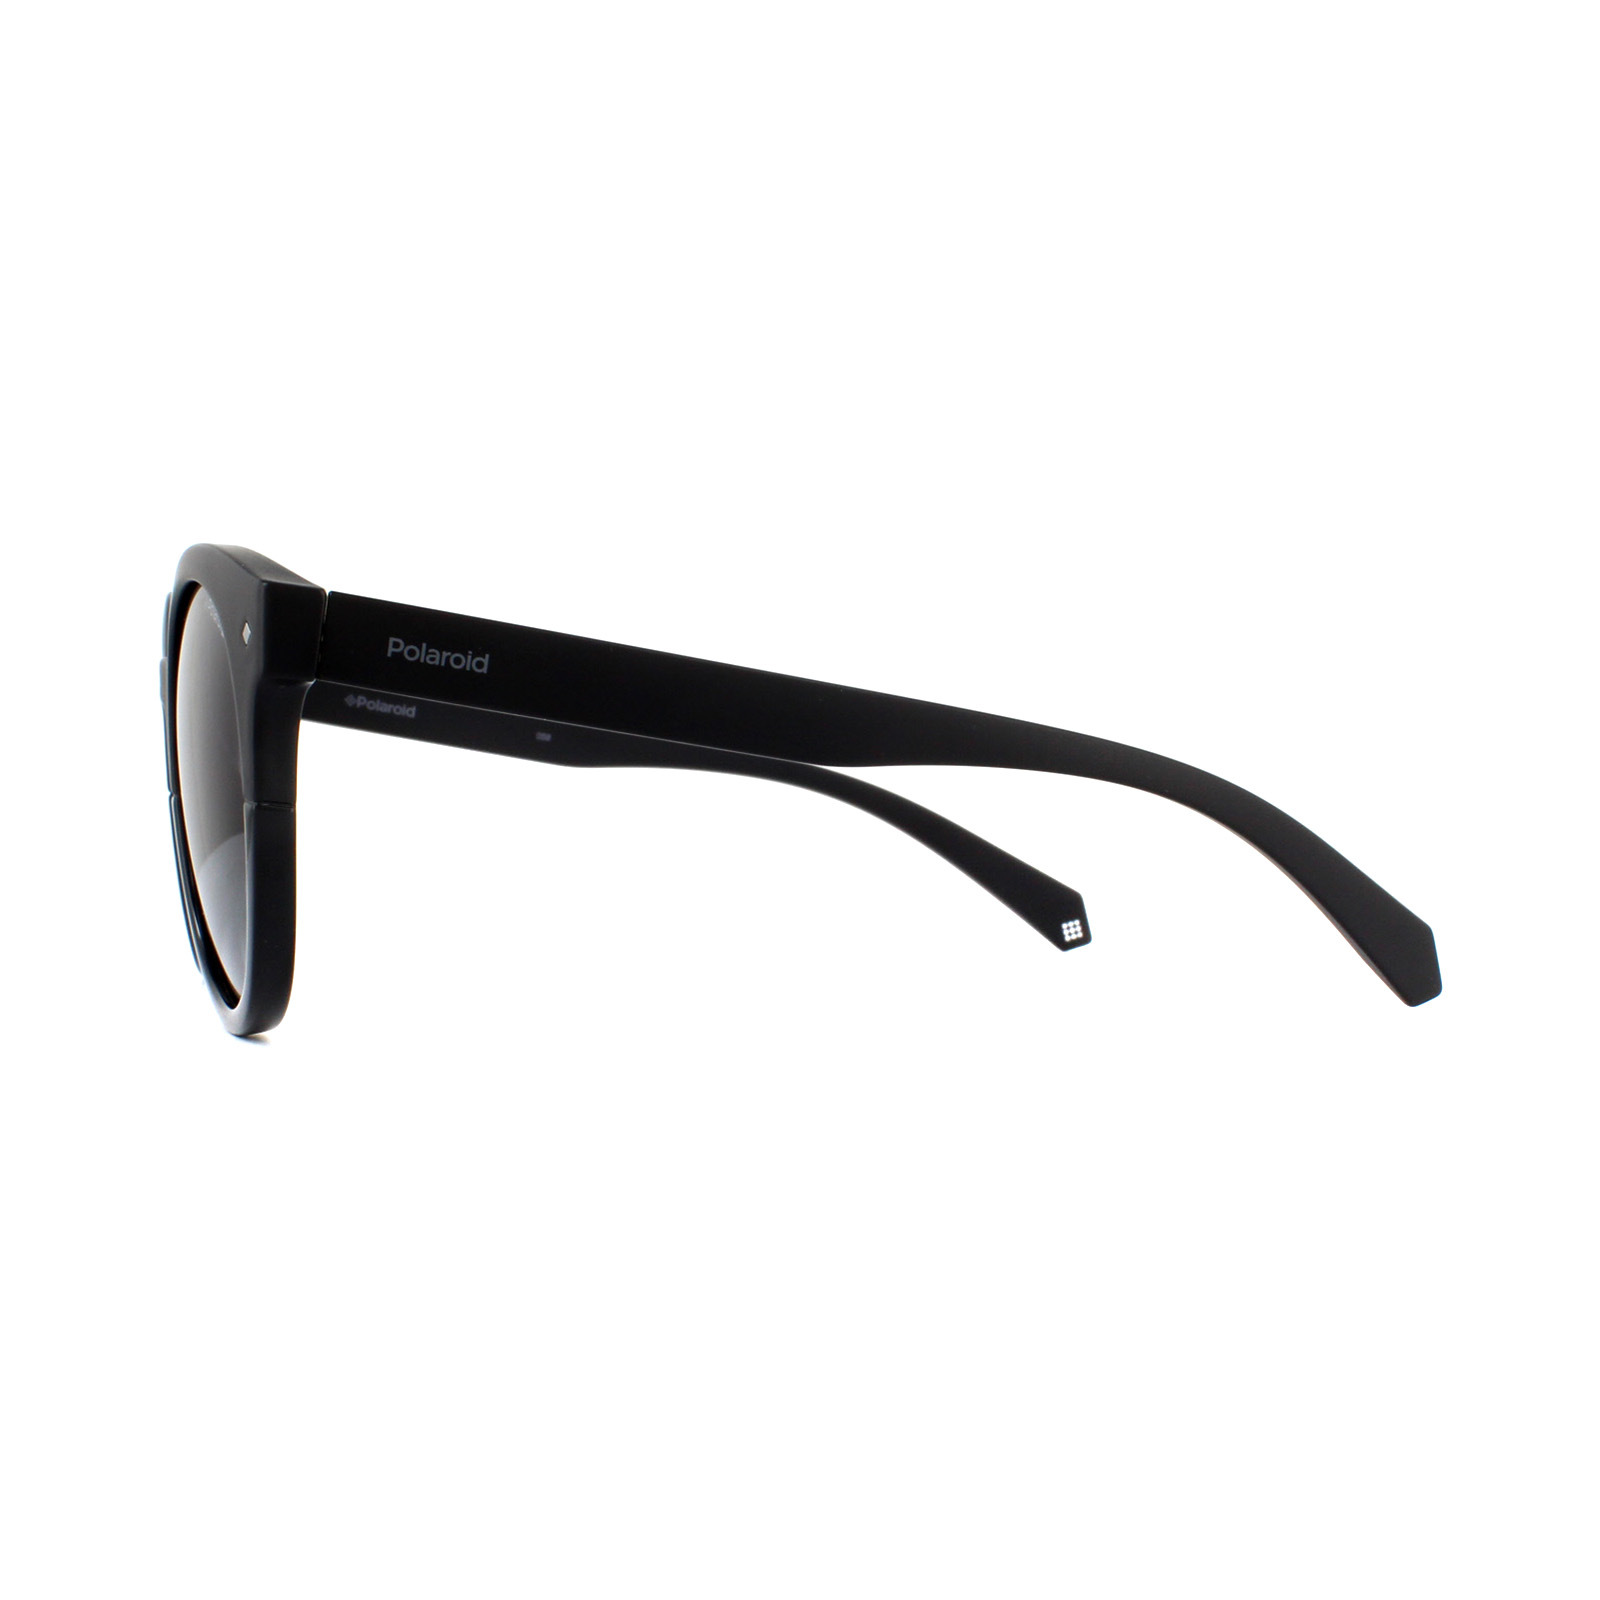 42a7fae4573 Sentinel Polaroid Sunglasses PLD 6043 S 807 WJ Black Grey Gradient Polarized